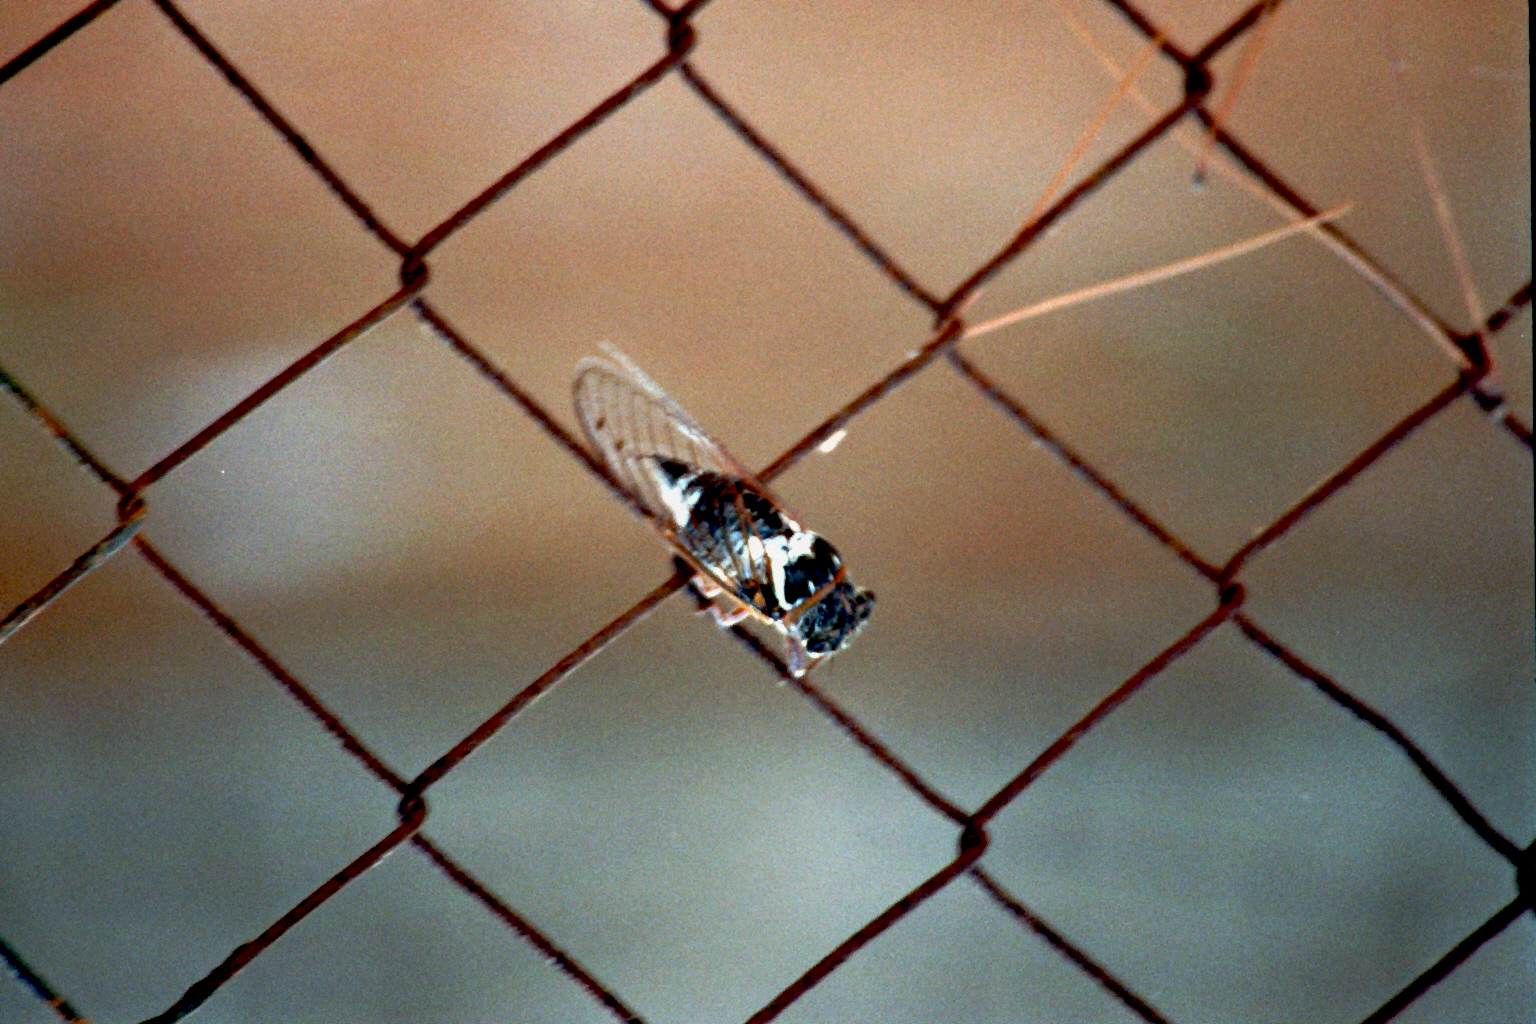 Zikade am Maschendrahtzaun 1